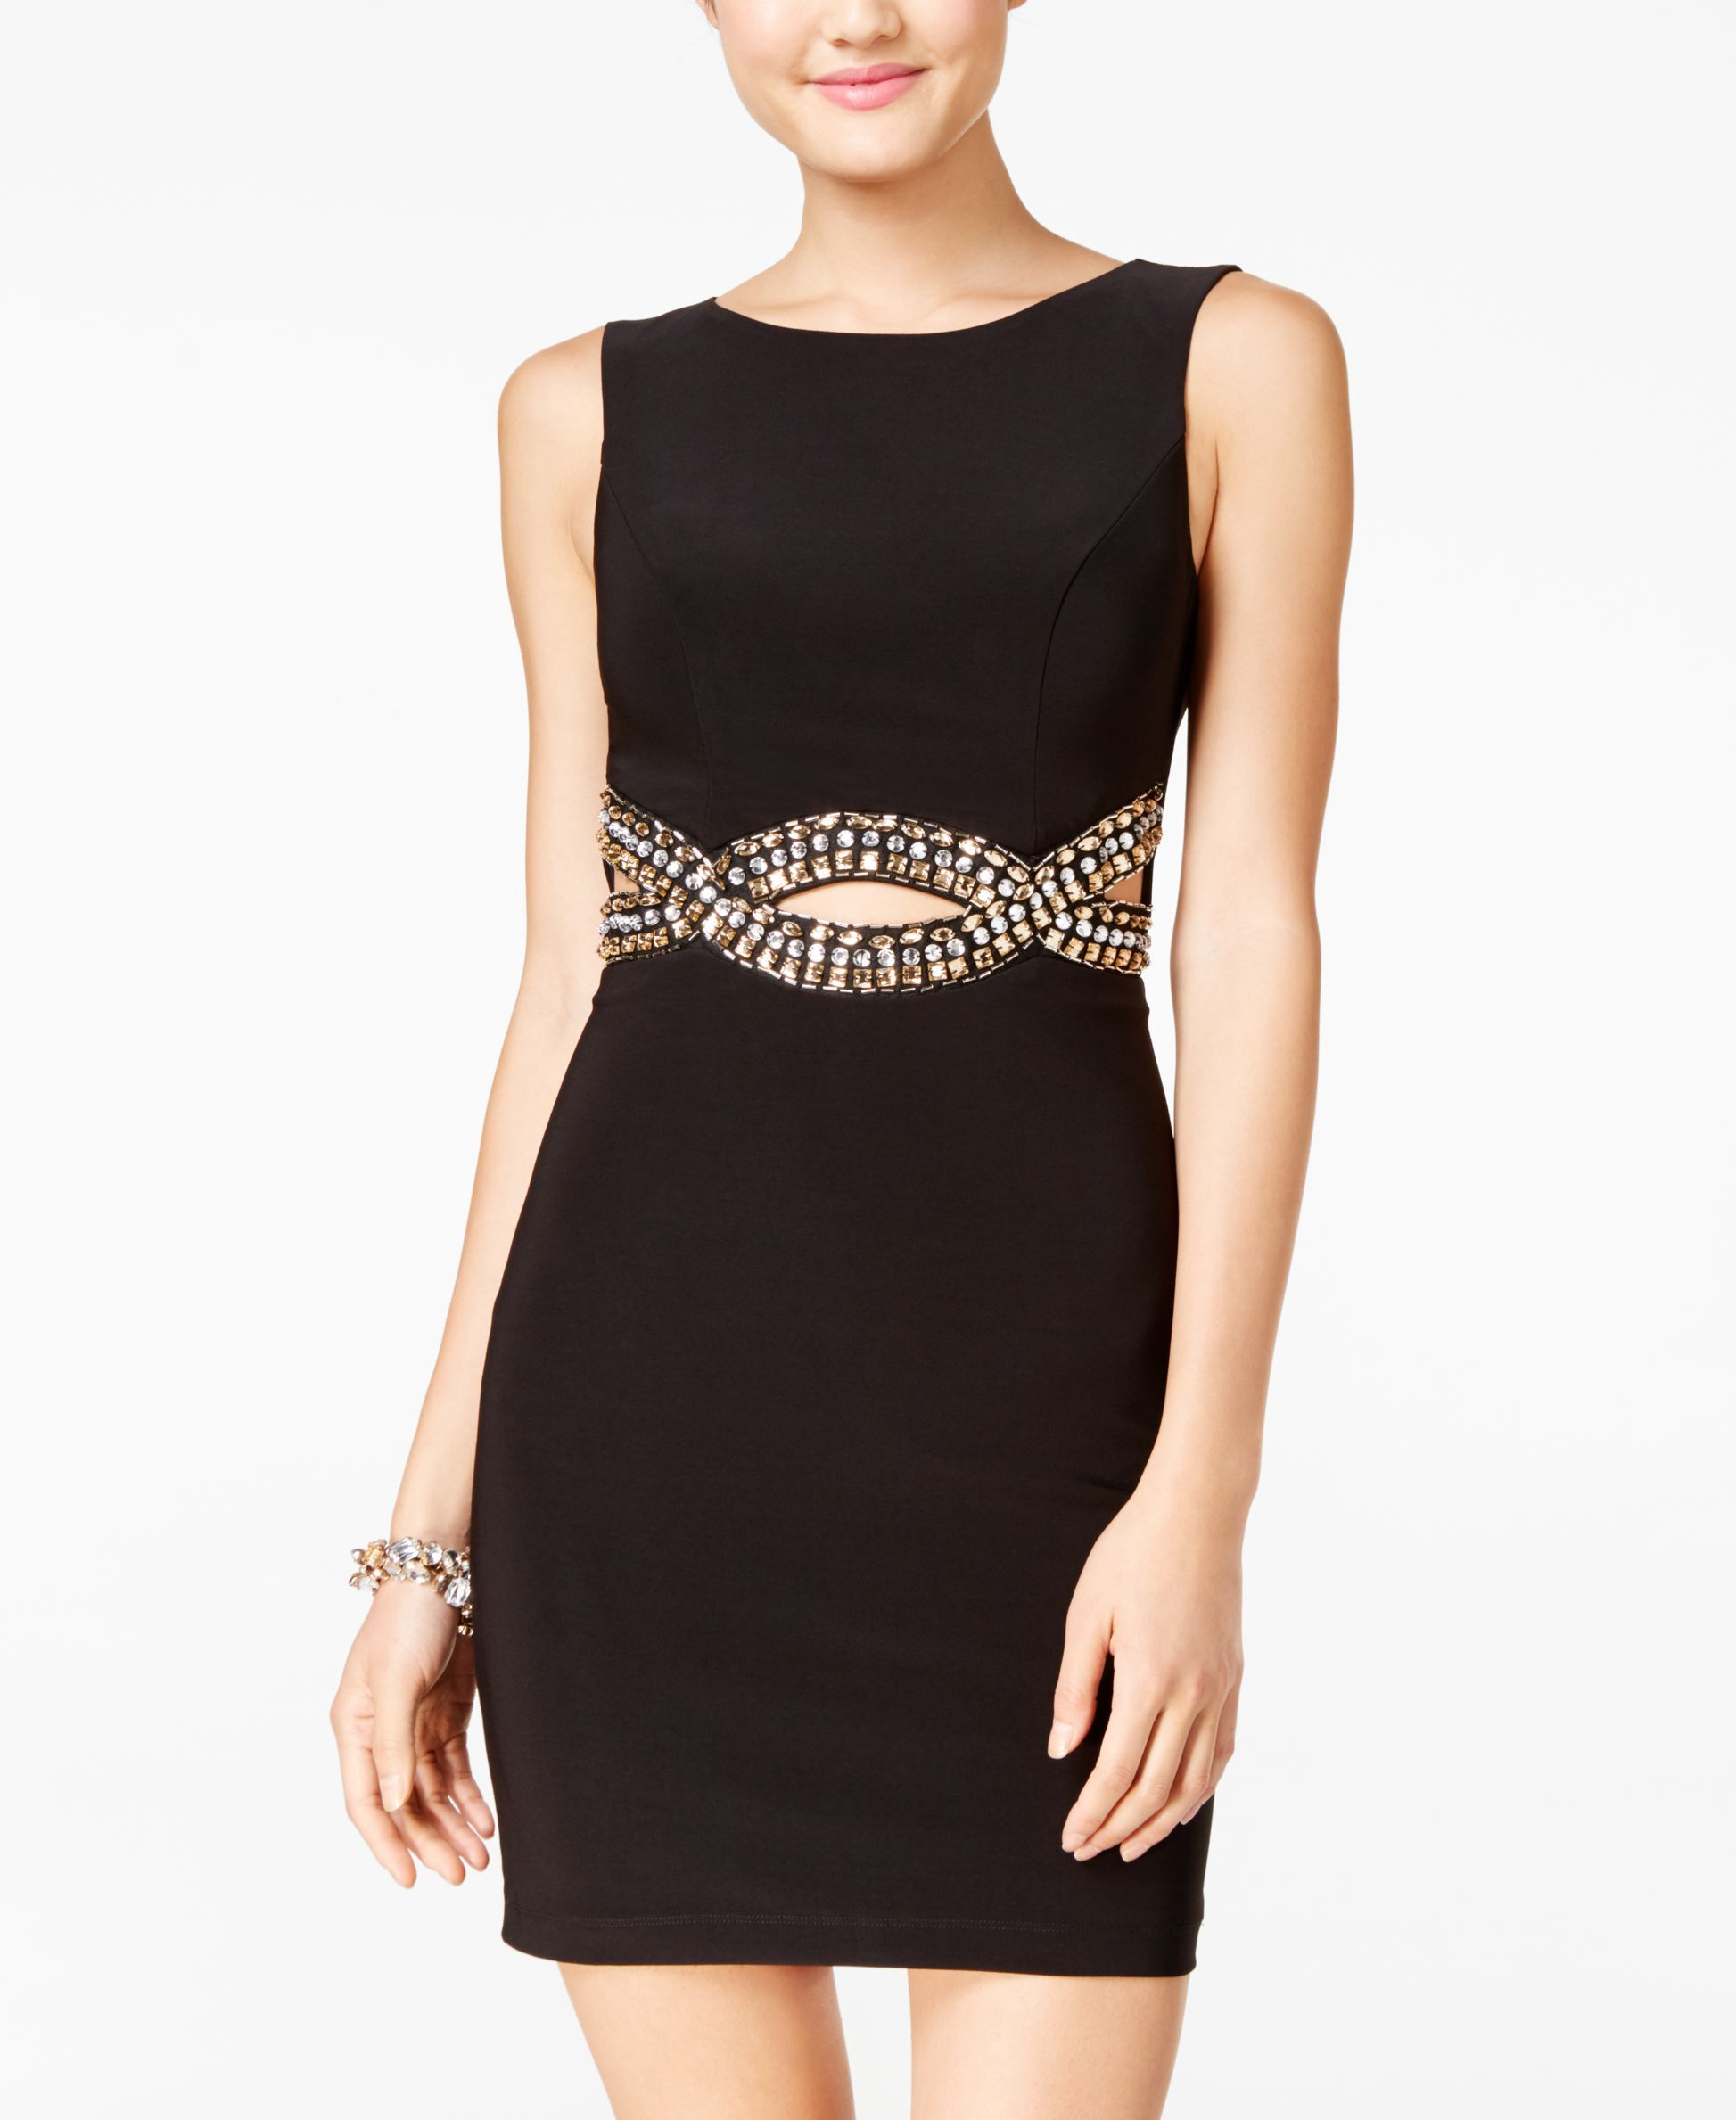 B darlin juniorsu openback rhinestoneembellished dress váy đầm